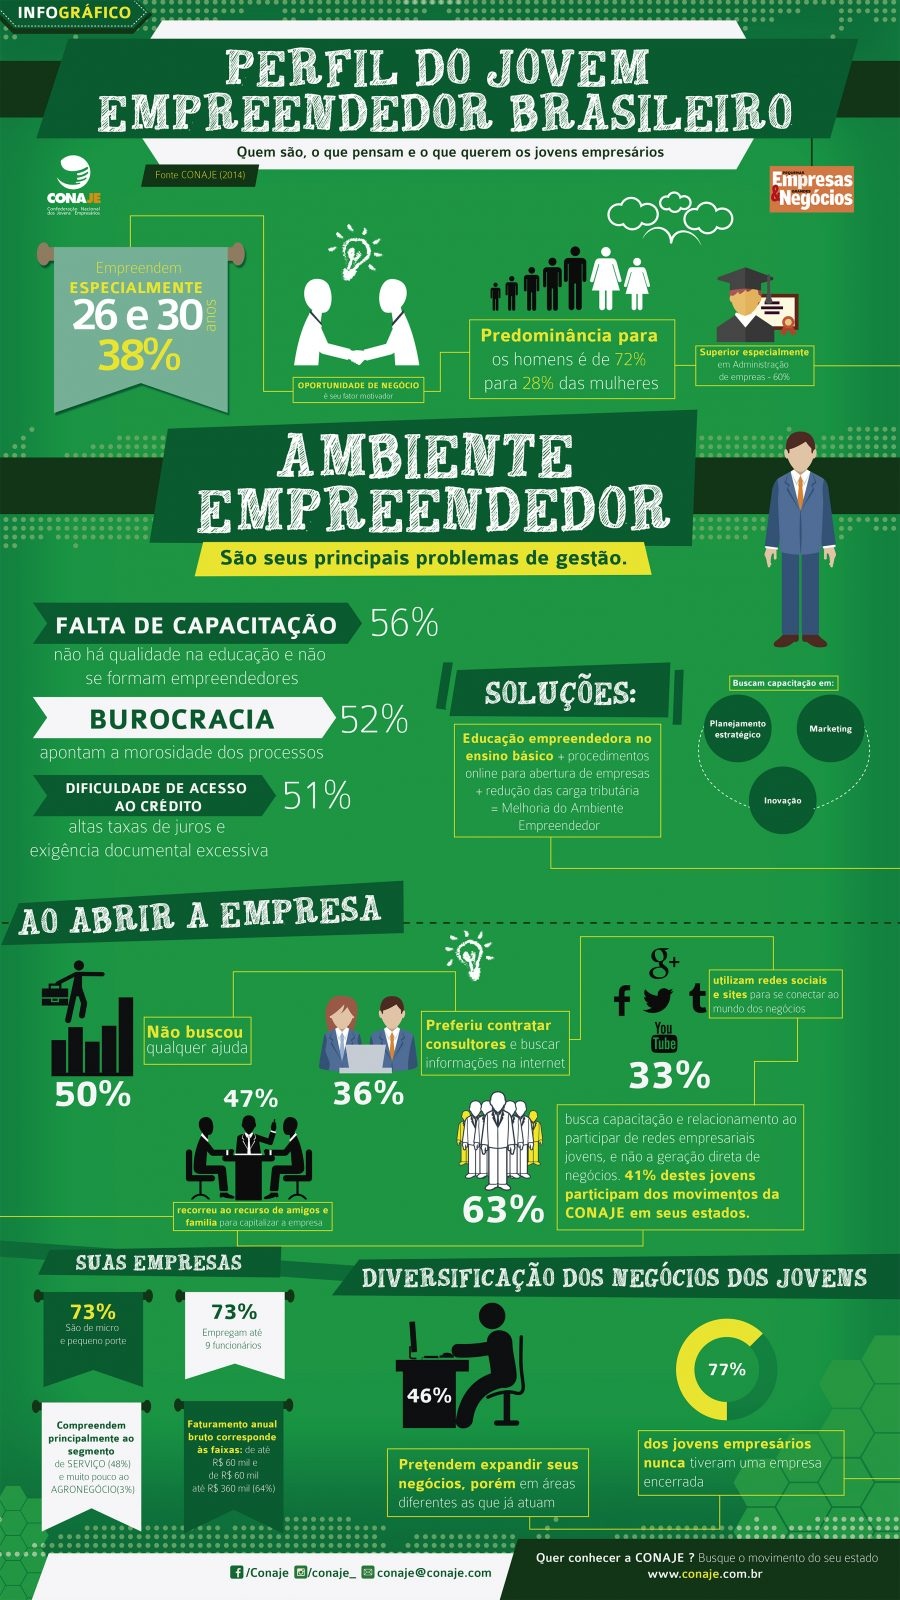 Perfil do empreendedor brasileiro